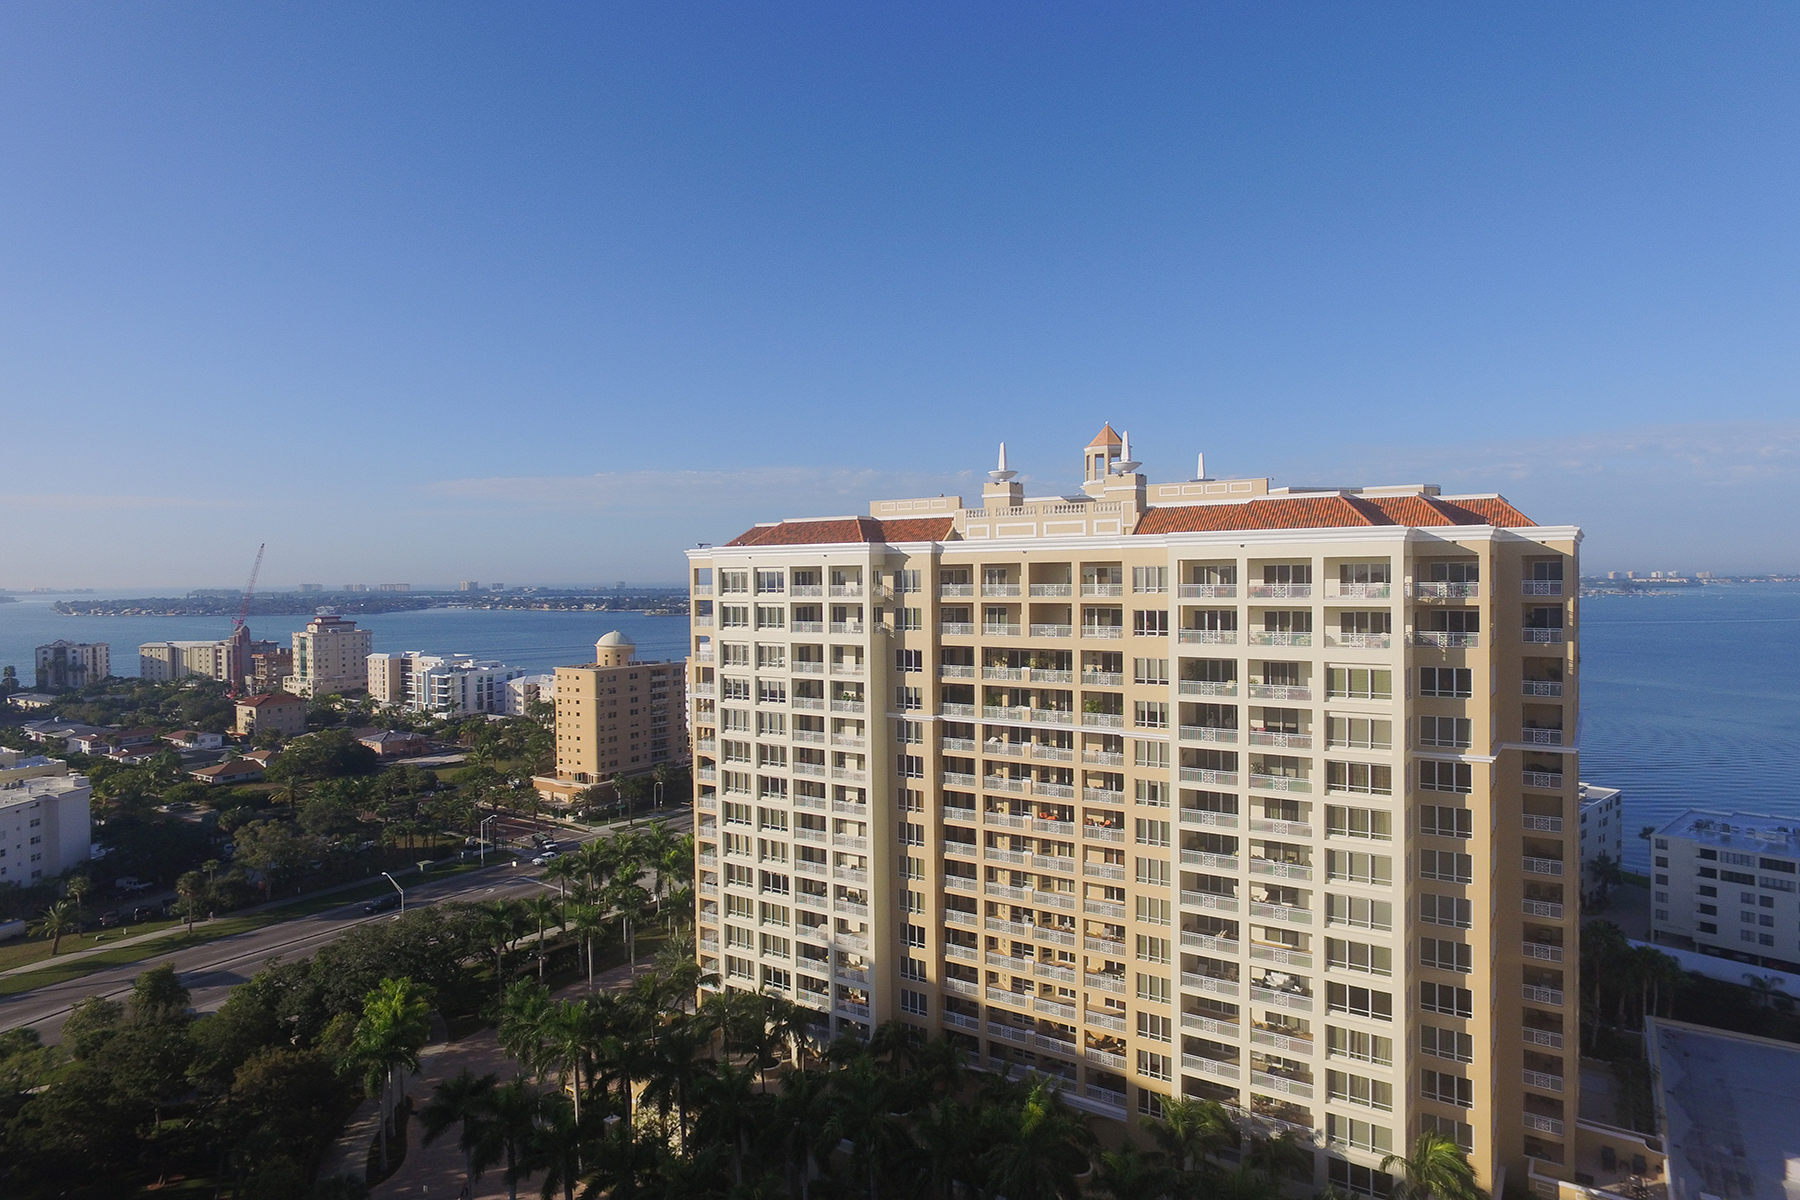 Condominium for Sale at RITZ TOWER RESIDENCES 35 Watergate Dr 1206 Sarasota, Florida, 34236 United States